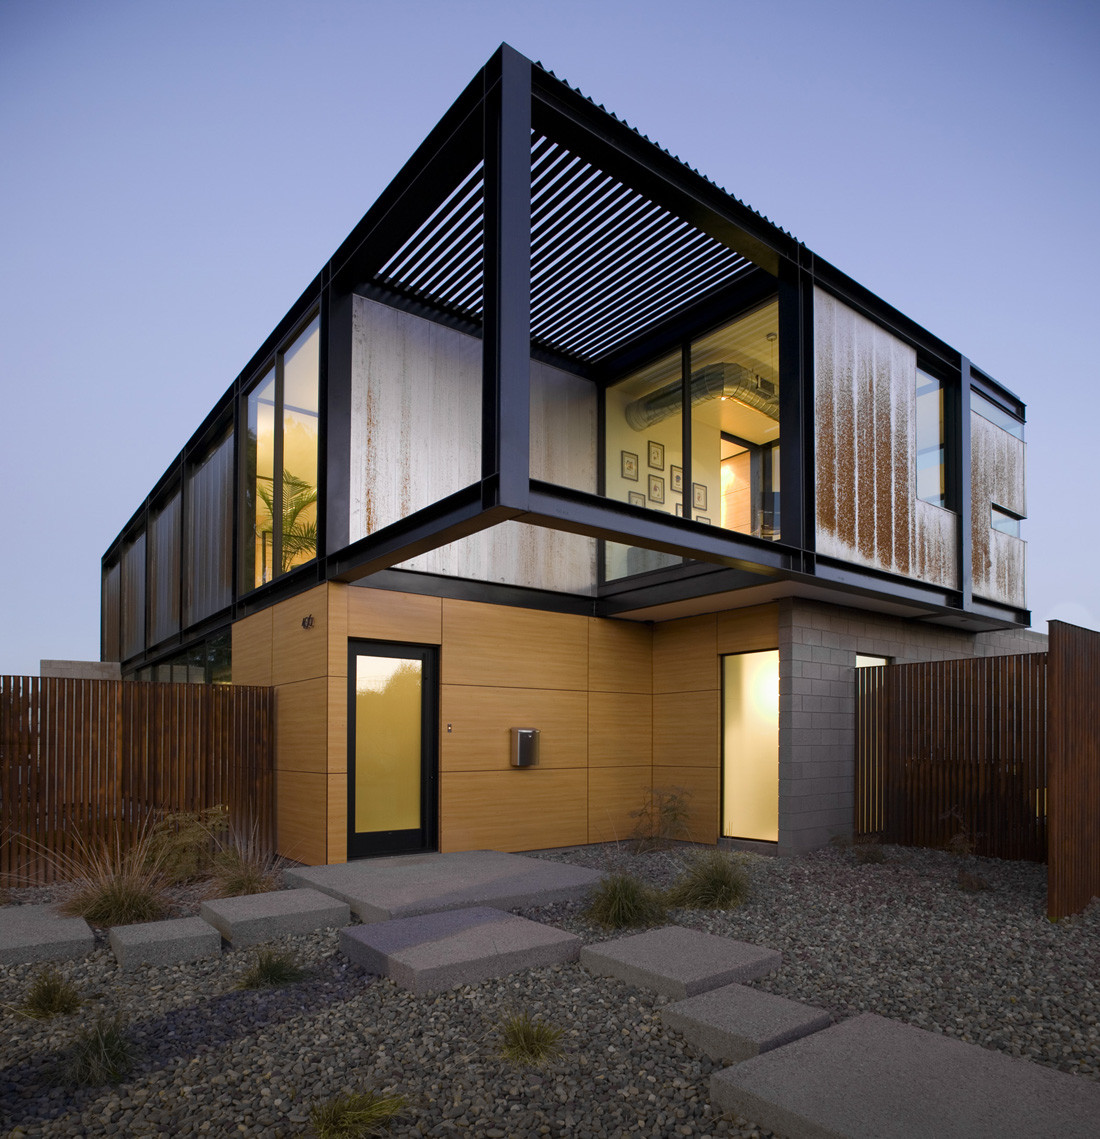 Sosnowski Residence / Chen + Suchart Studio, LLC, © Bill Timmerman